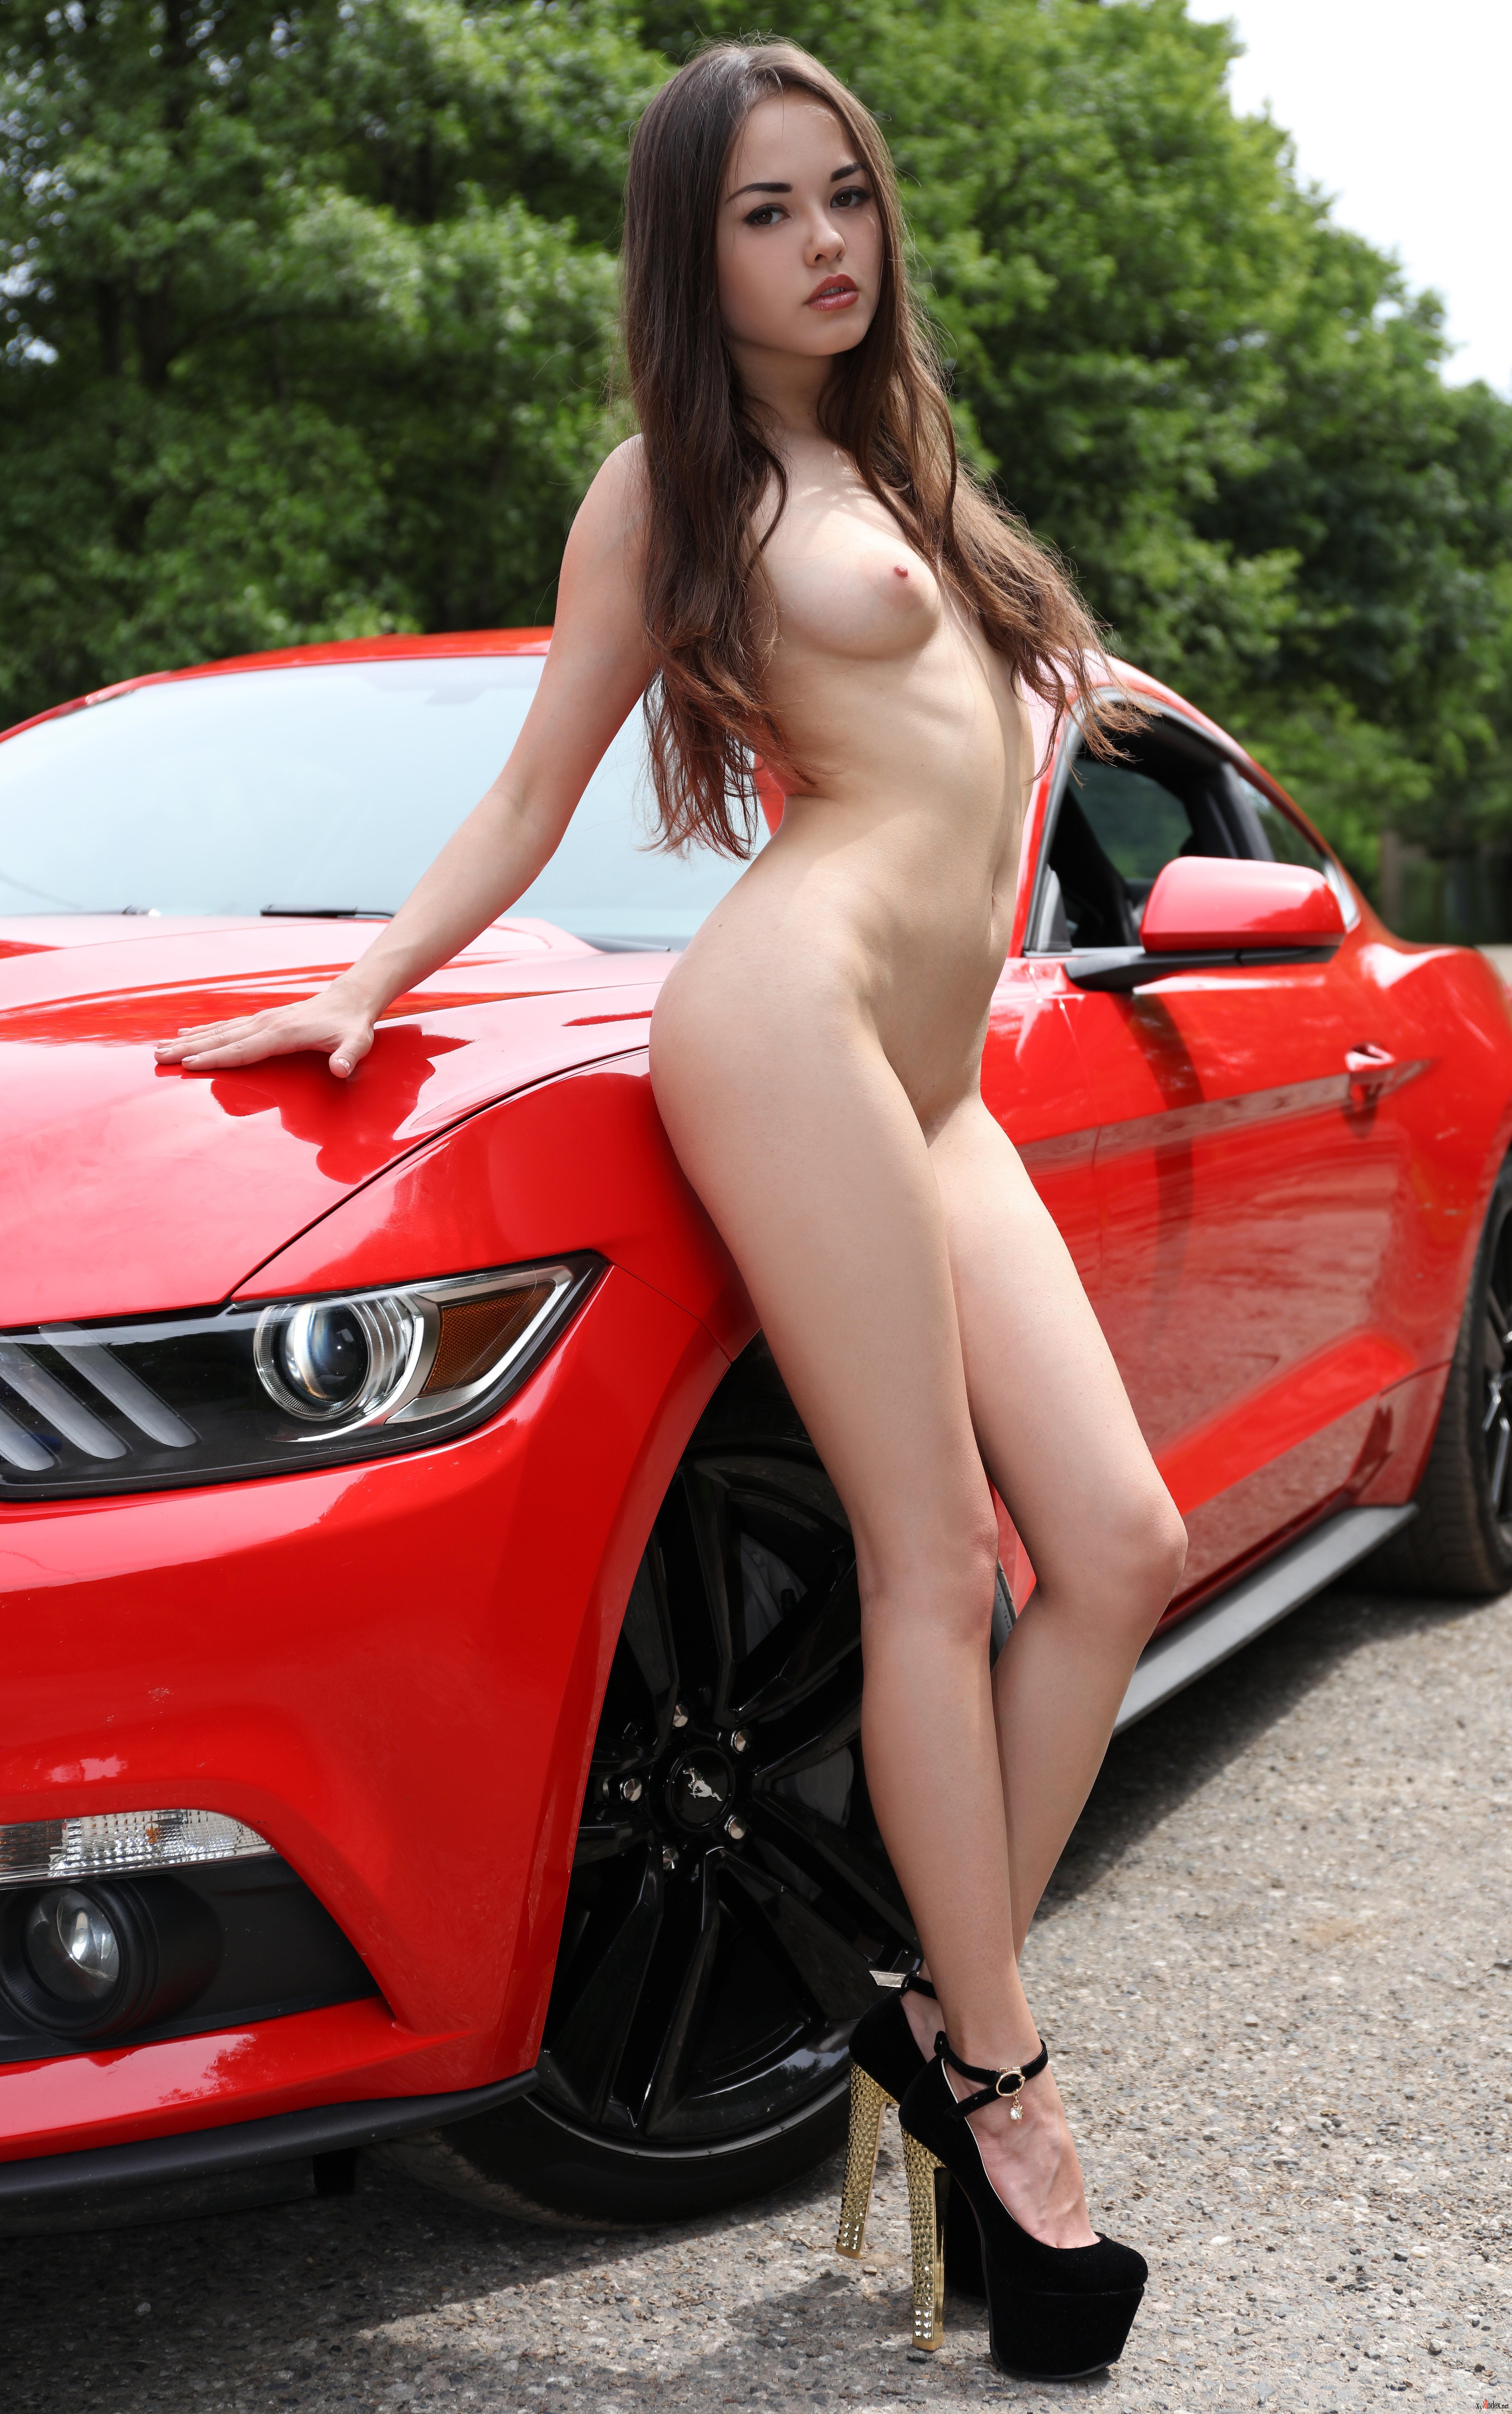 Mustang nude girl — 1